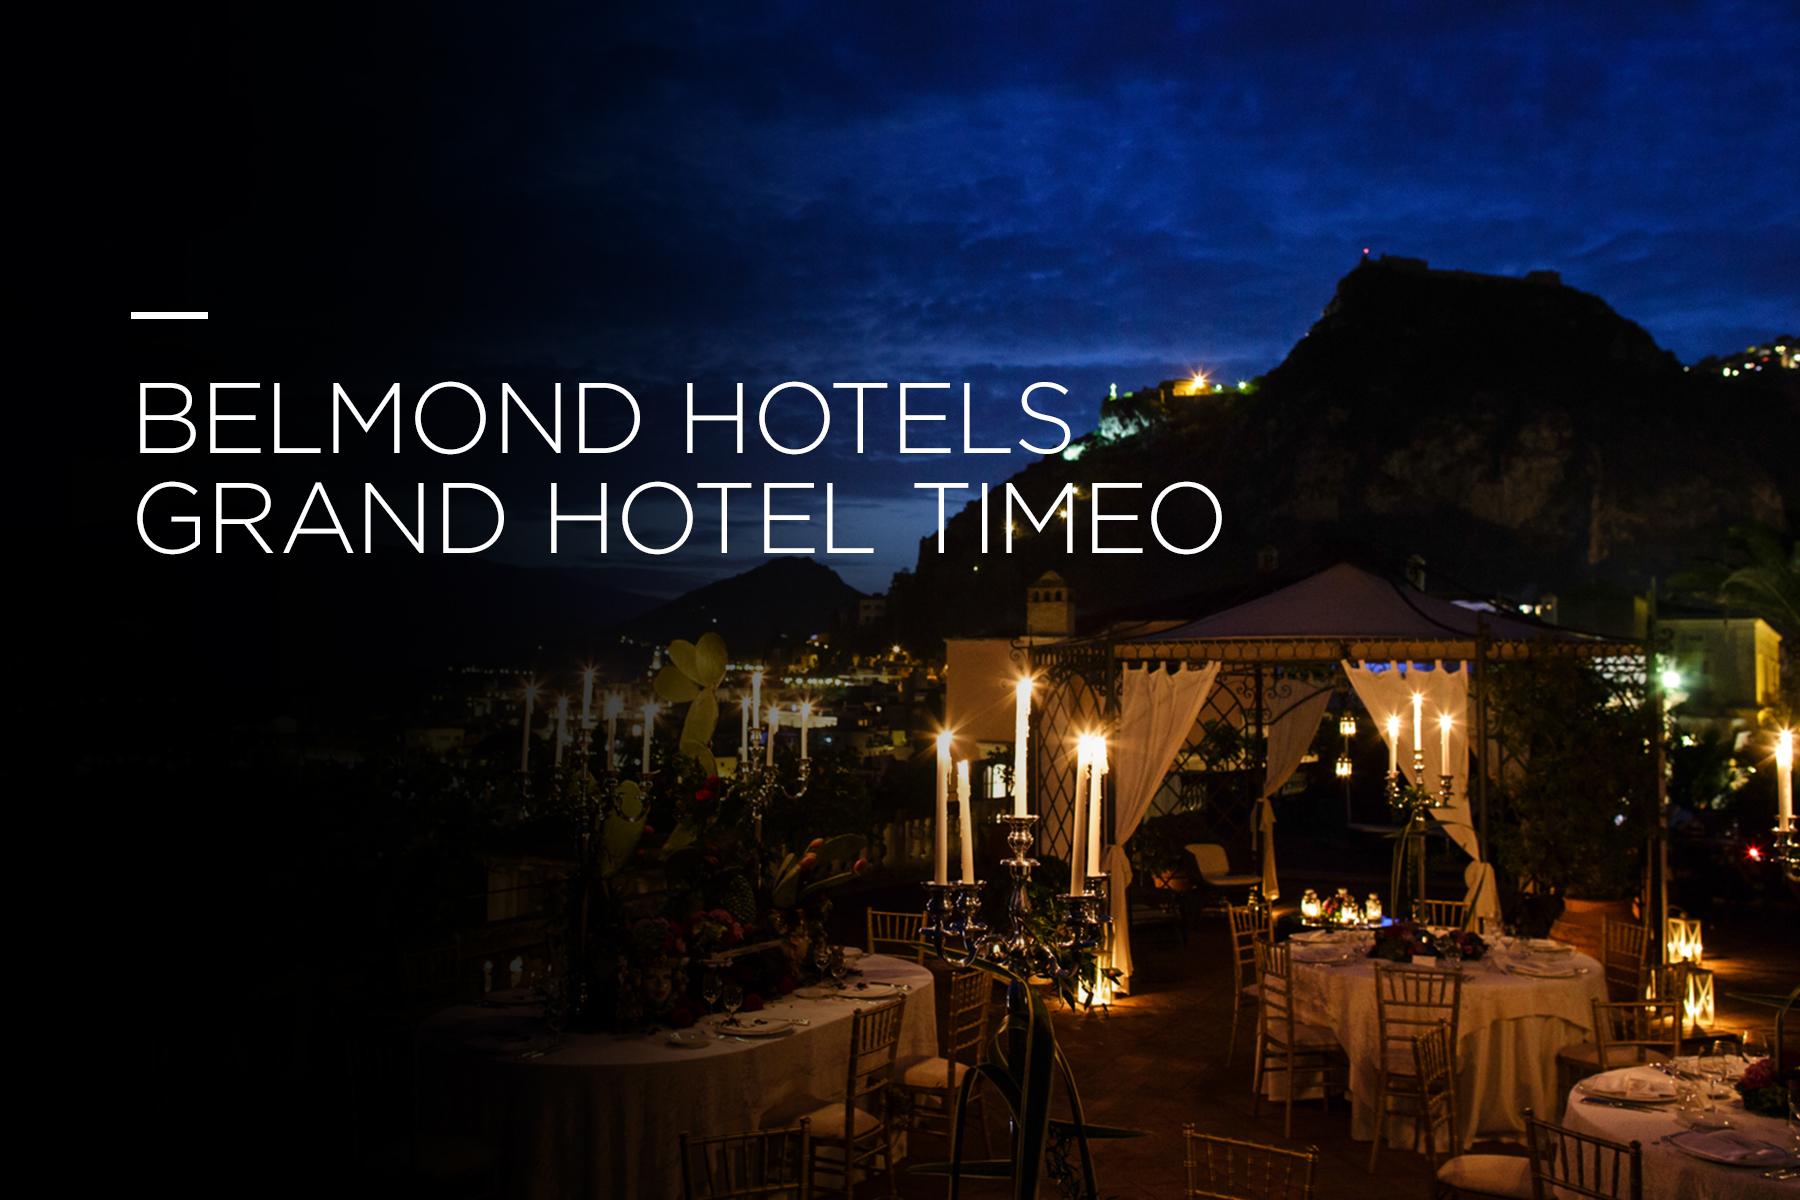 Belmond Hotels Grand Hotel Timeo